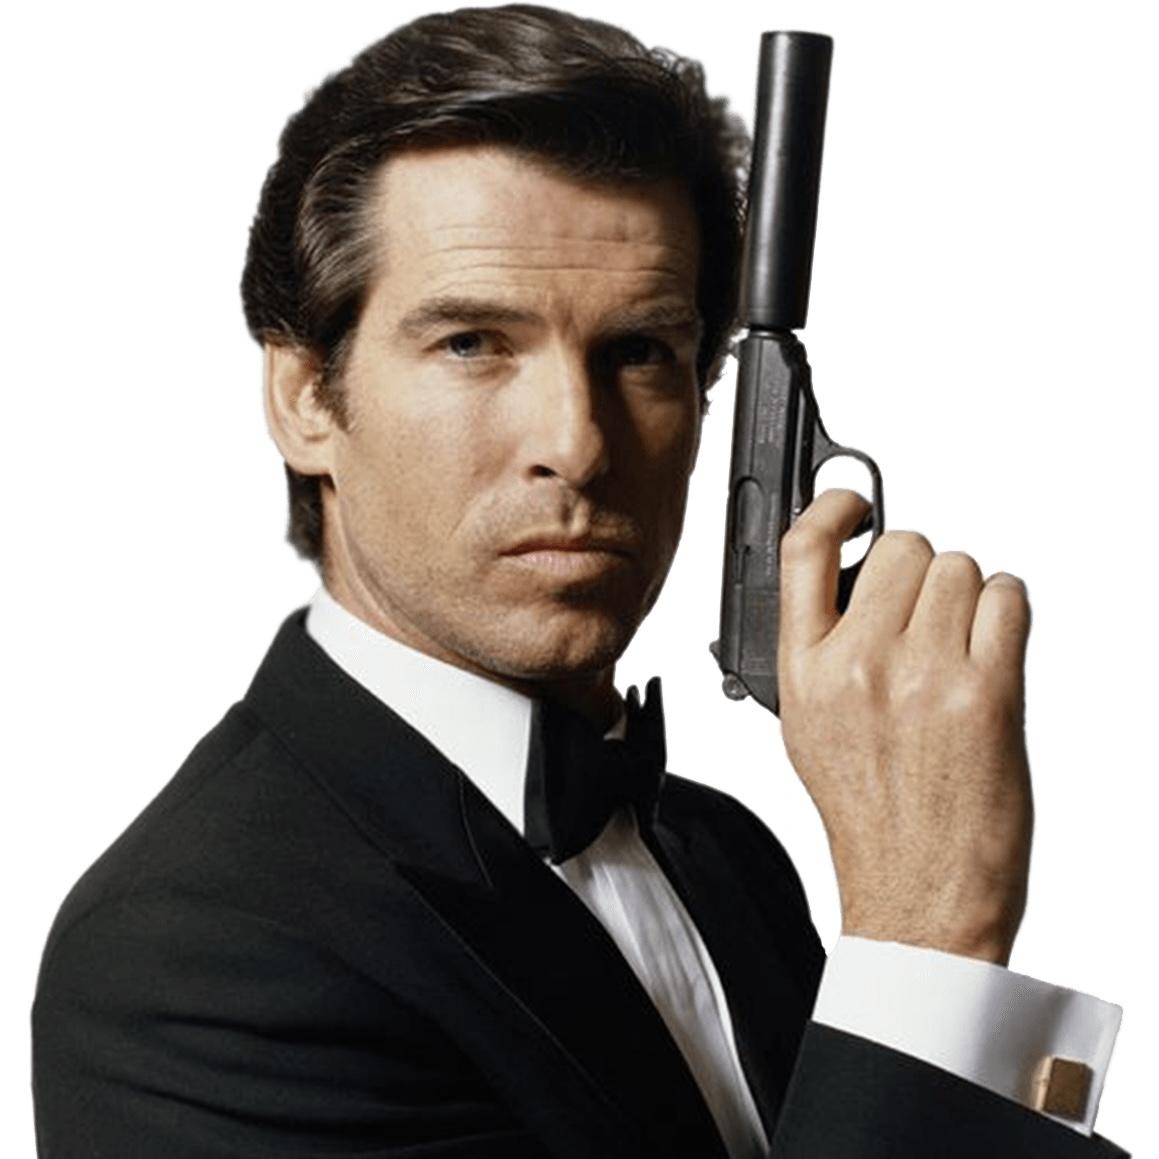 Pierce Brosnan James Bond